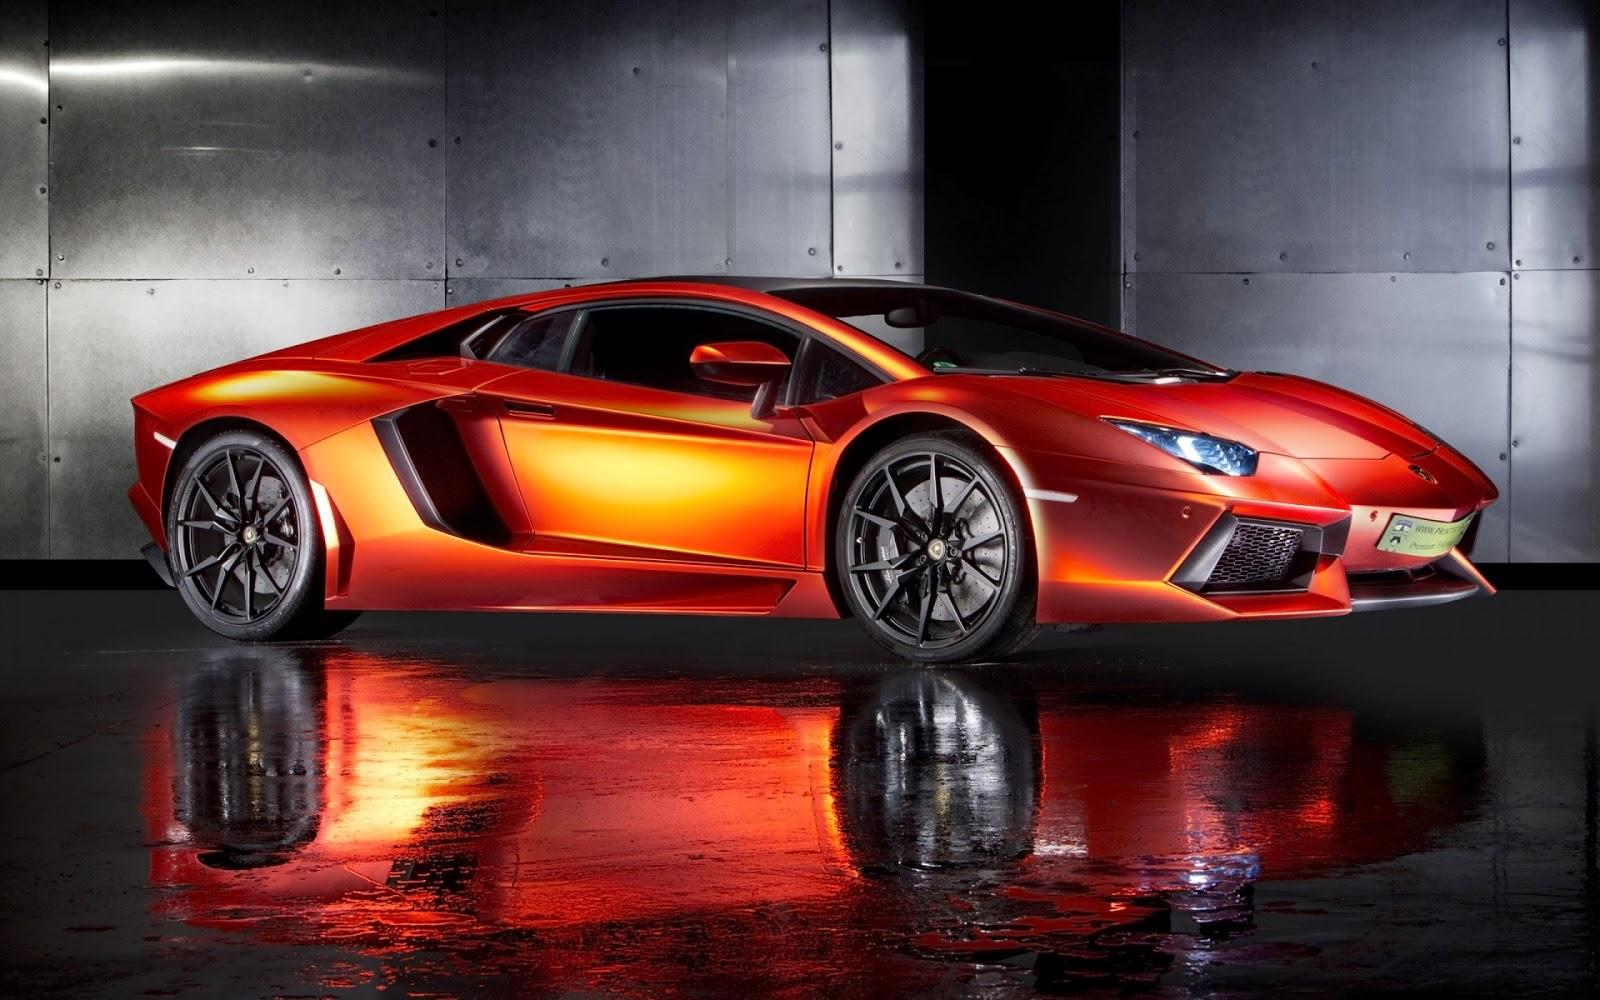 2013 Lamborghini Aventador Color Naranja